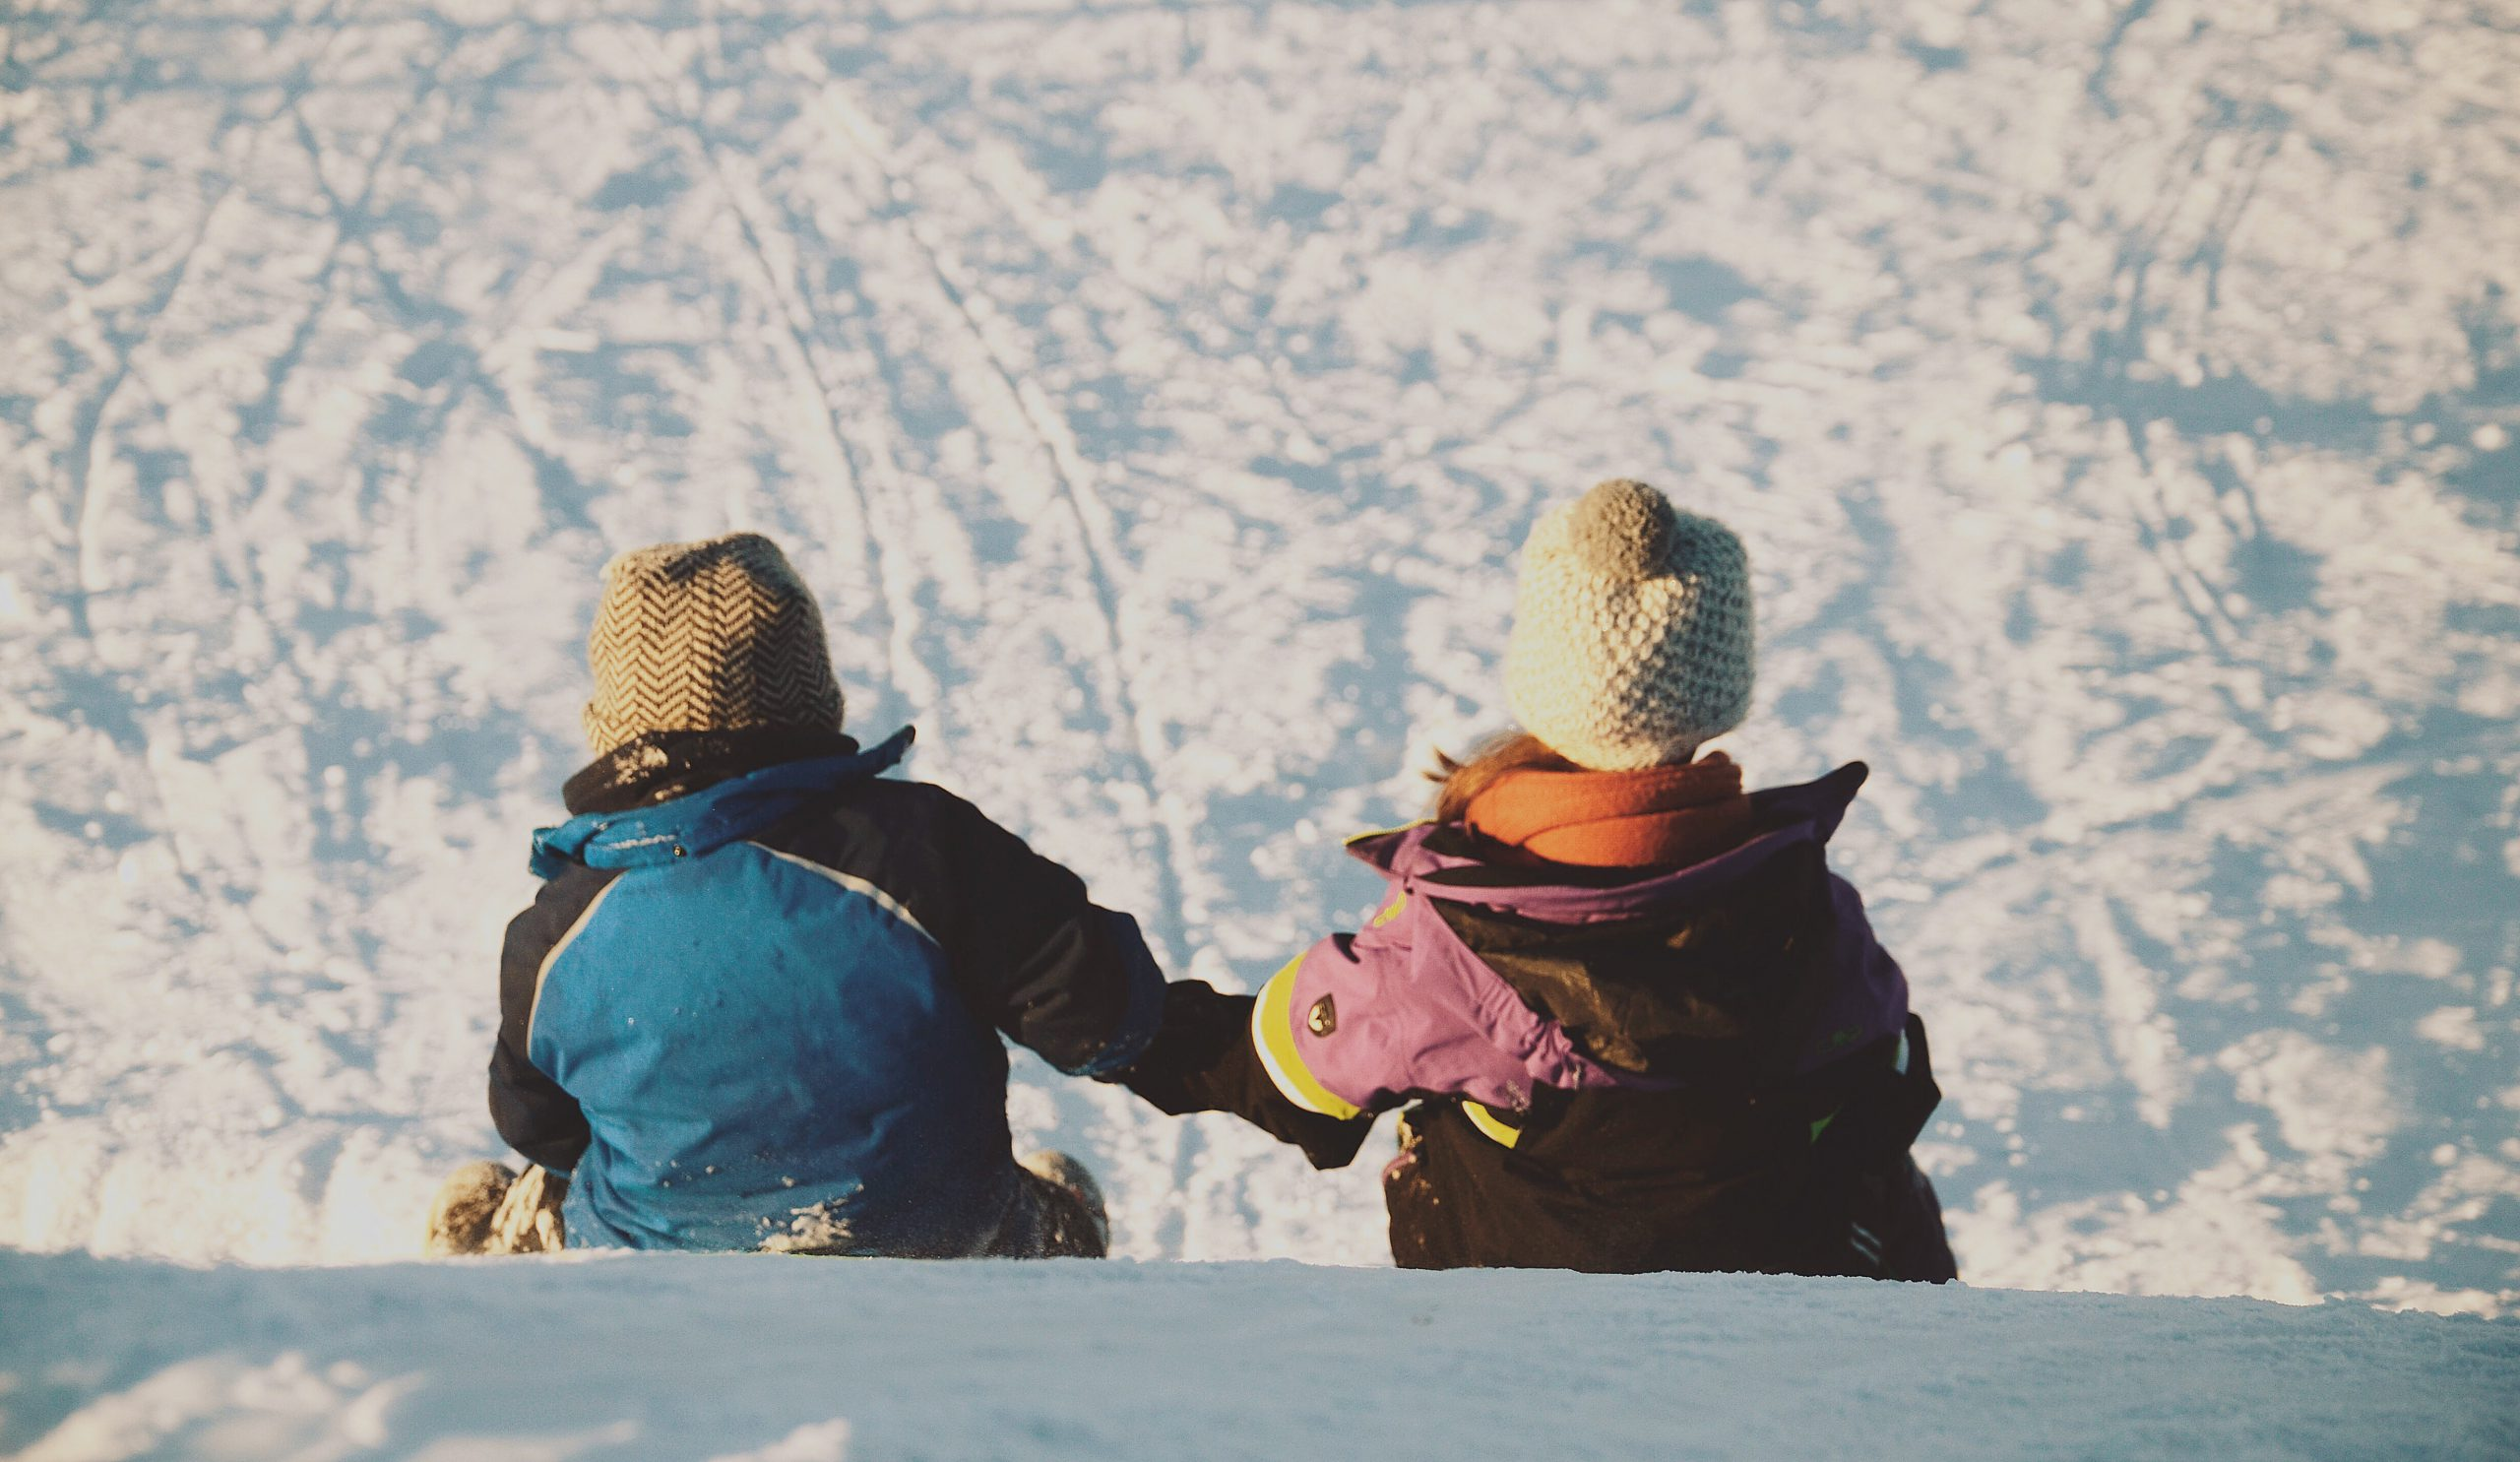 Children in winter ski clothing sitting on snow holding hands